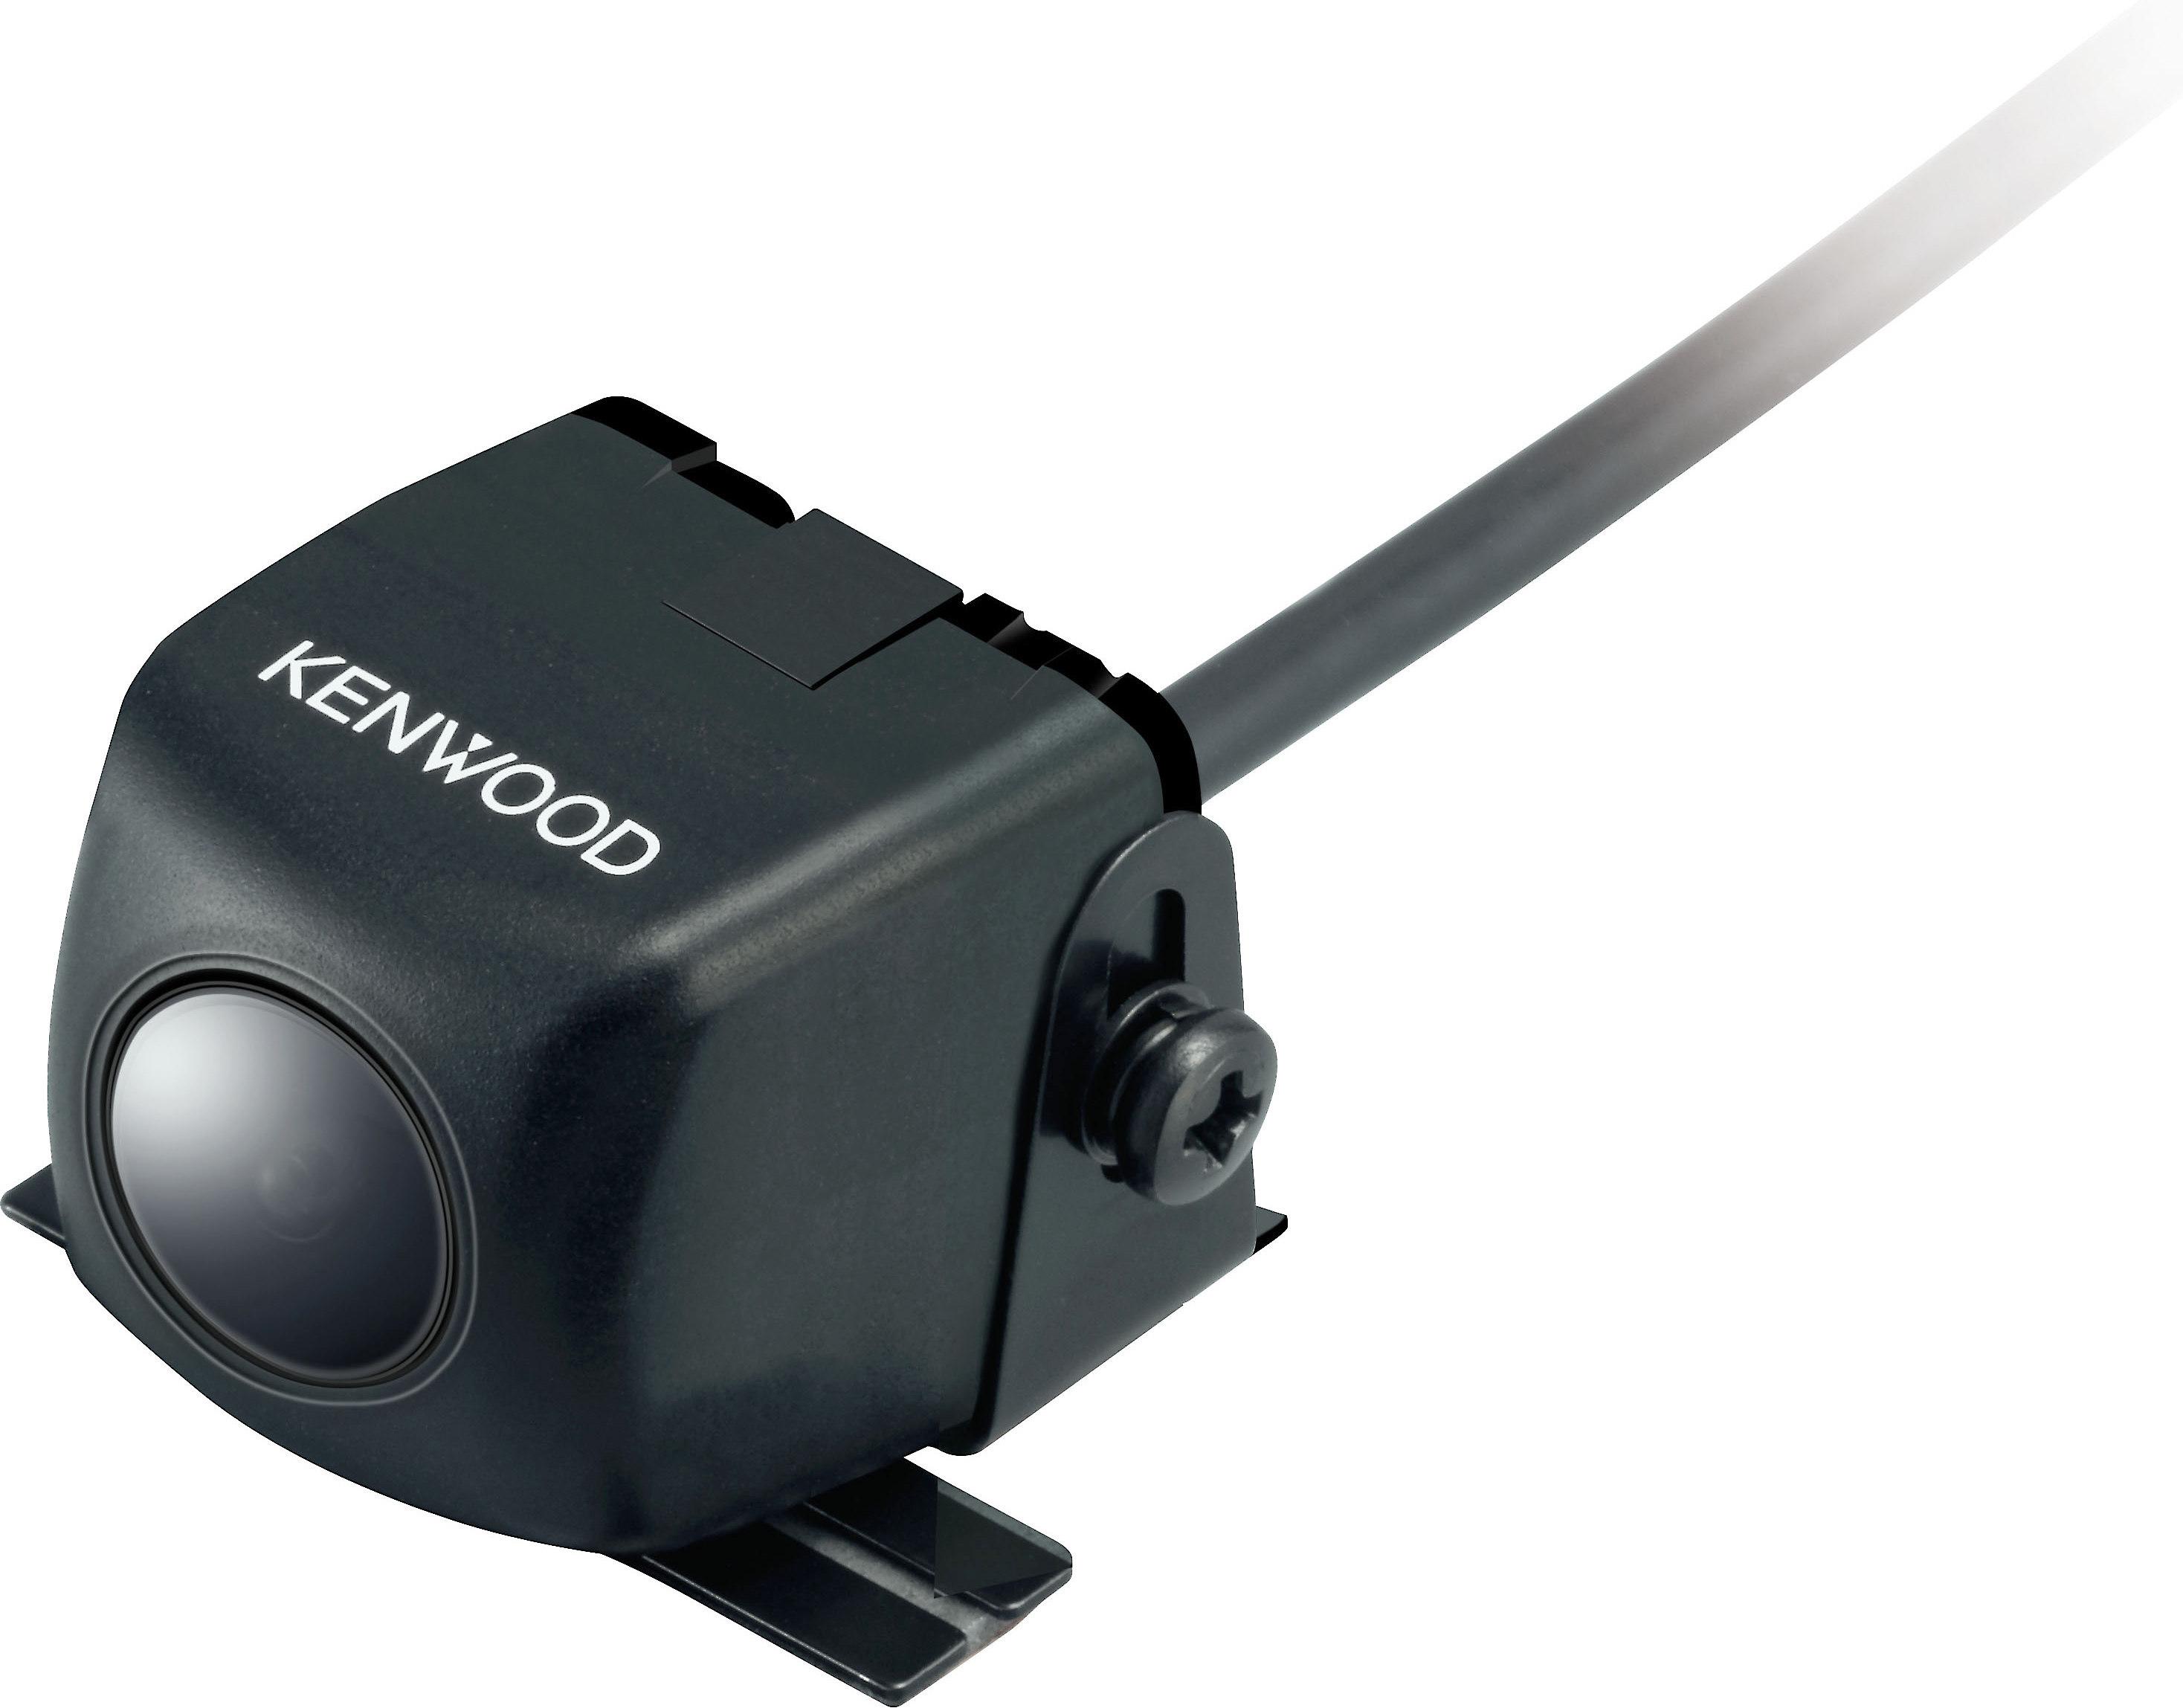 KENWOOD CMOS 320 UNIVERSAL REVERSING MULTI VIEW CAMERA FOR AV SCREENS FRONT REAR